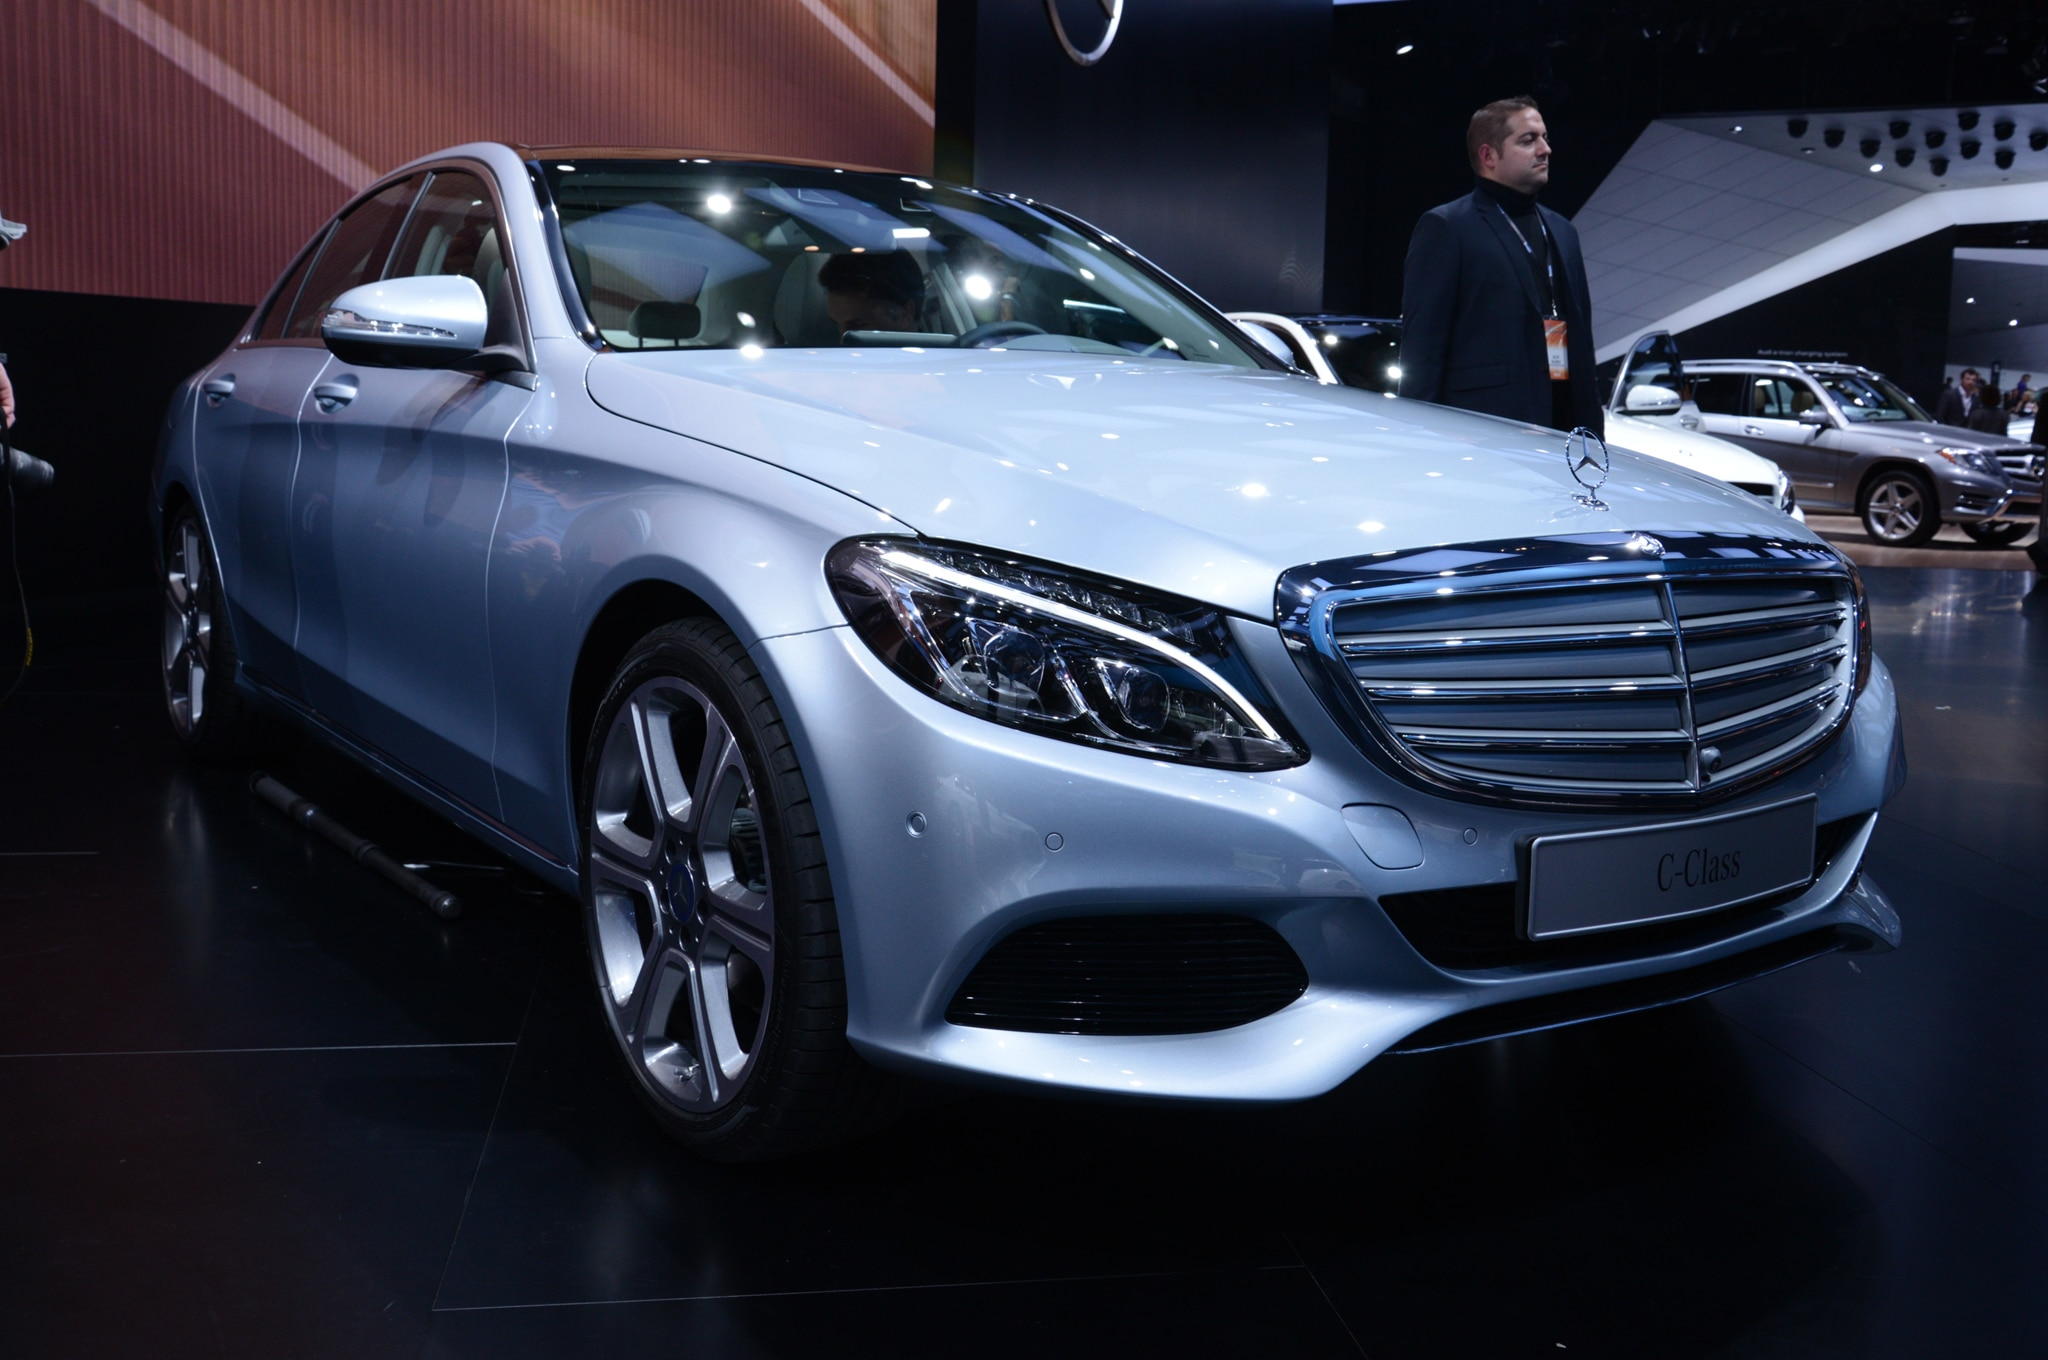 2015 Mercedes Benz C Class Front View2